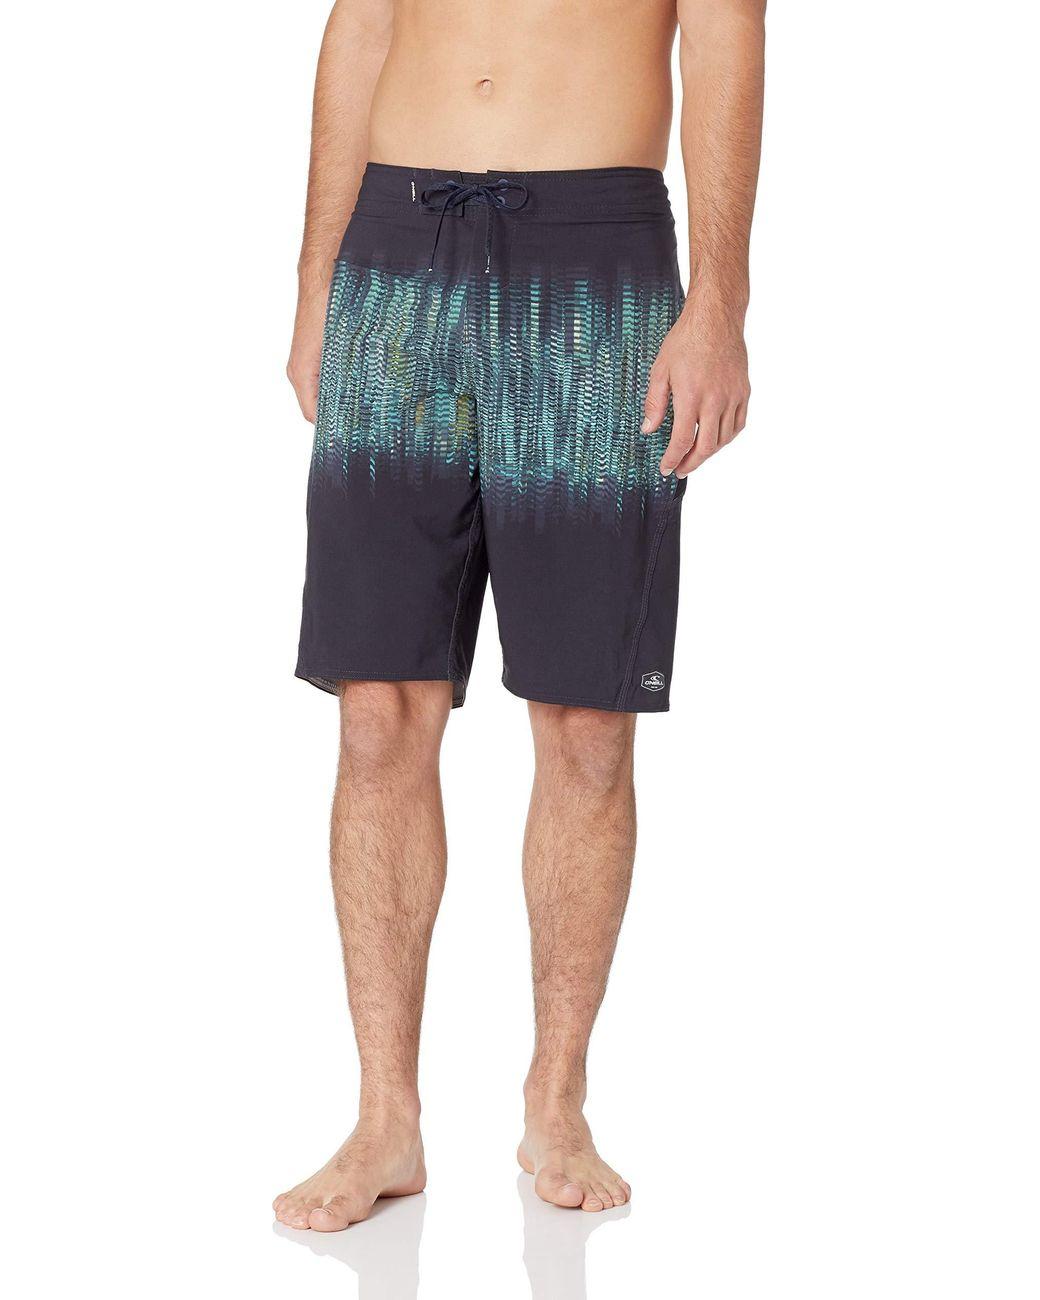 Yosemite Quick Dry Elastic Lace Boardshorts Beach Shorts Pants Swim Trunks Swimsuit with Pockets.